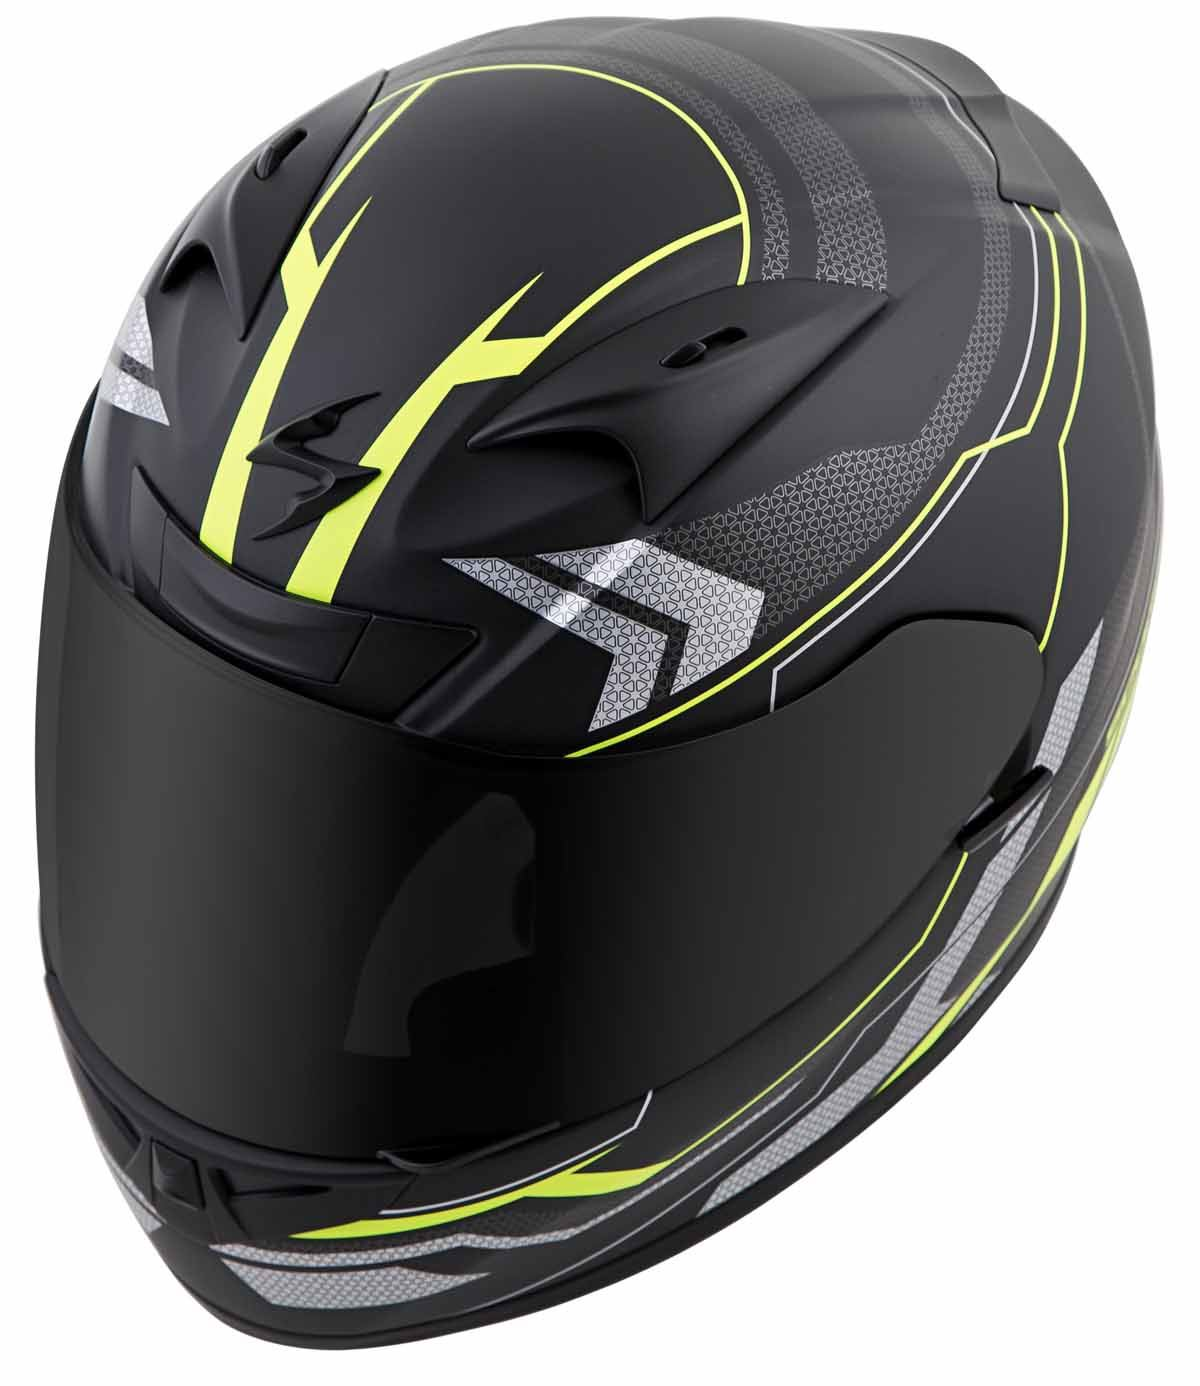 Scorpion-EXO-R710-Helmet-Fiberglass-Full-Face-DOT-SNELL-M2015-Certified-XS-2XL miniature 32